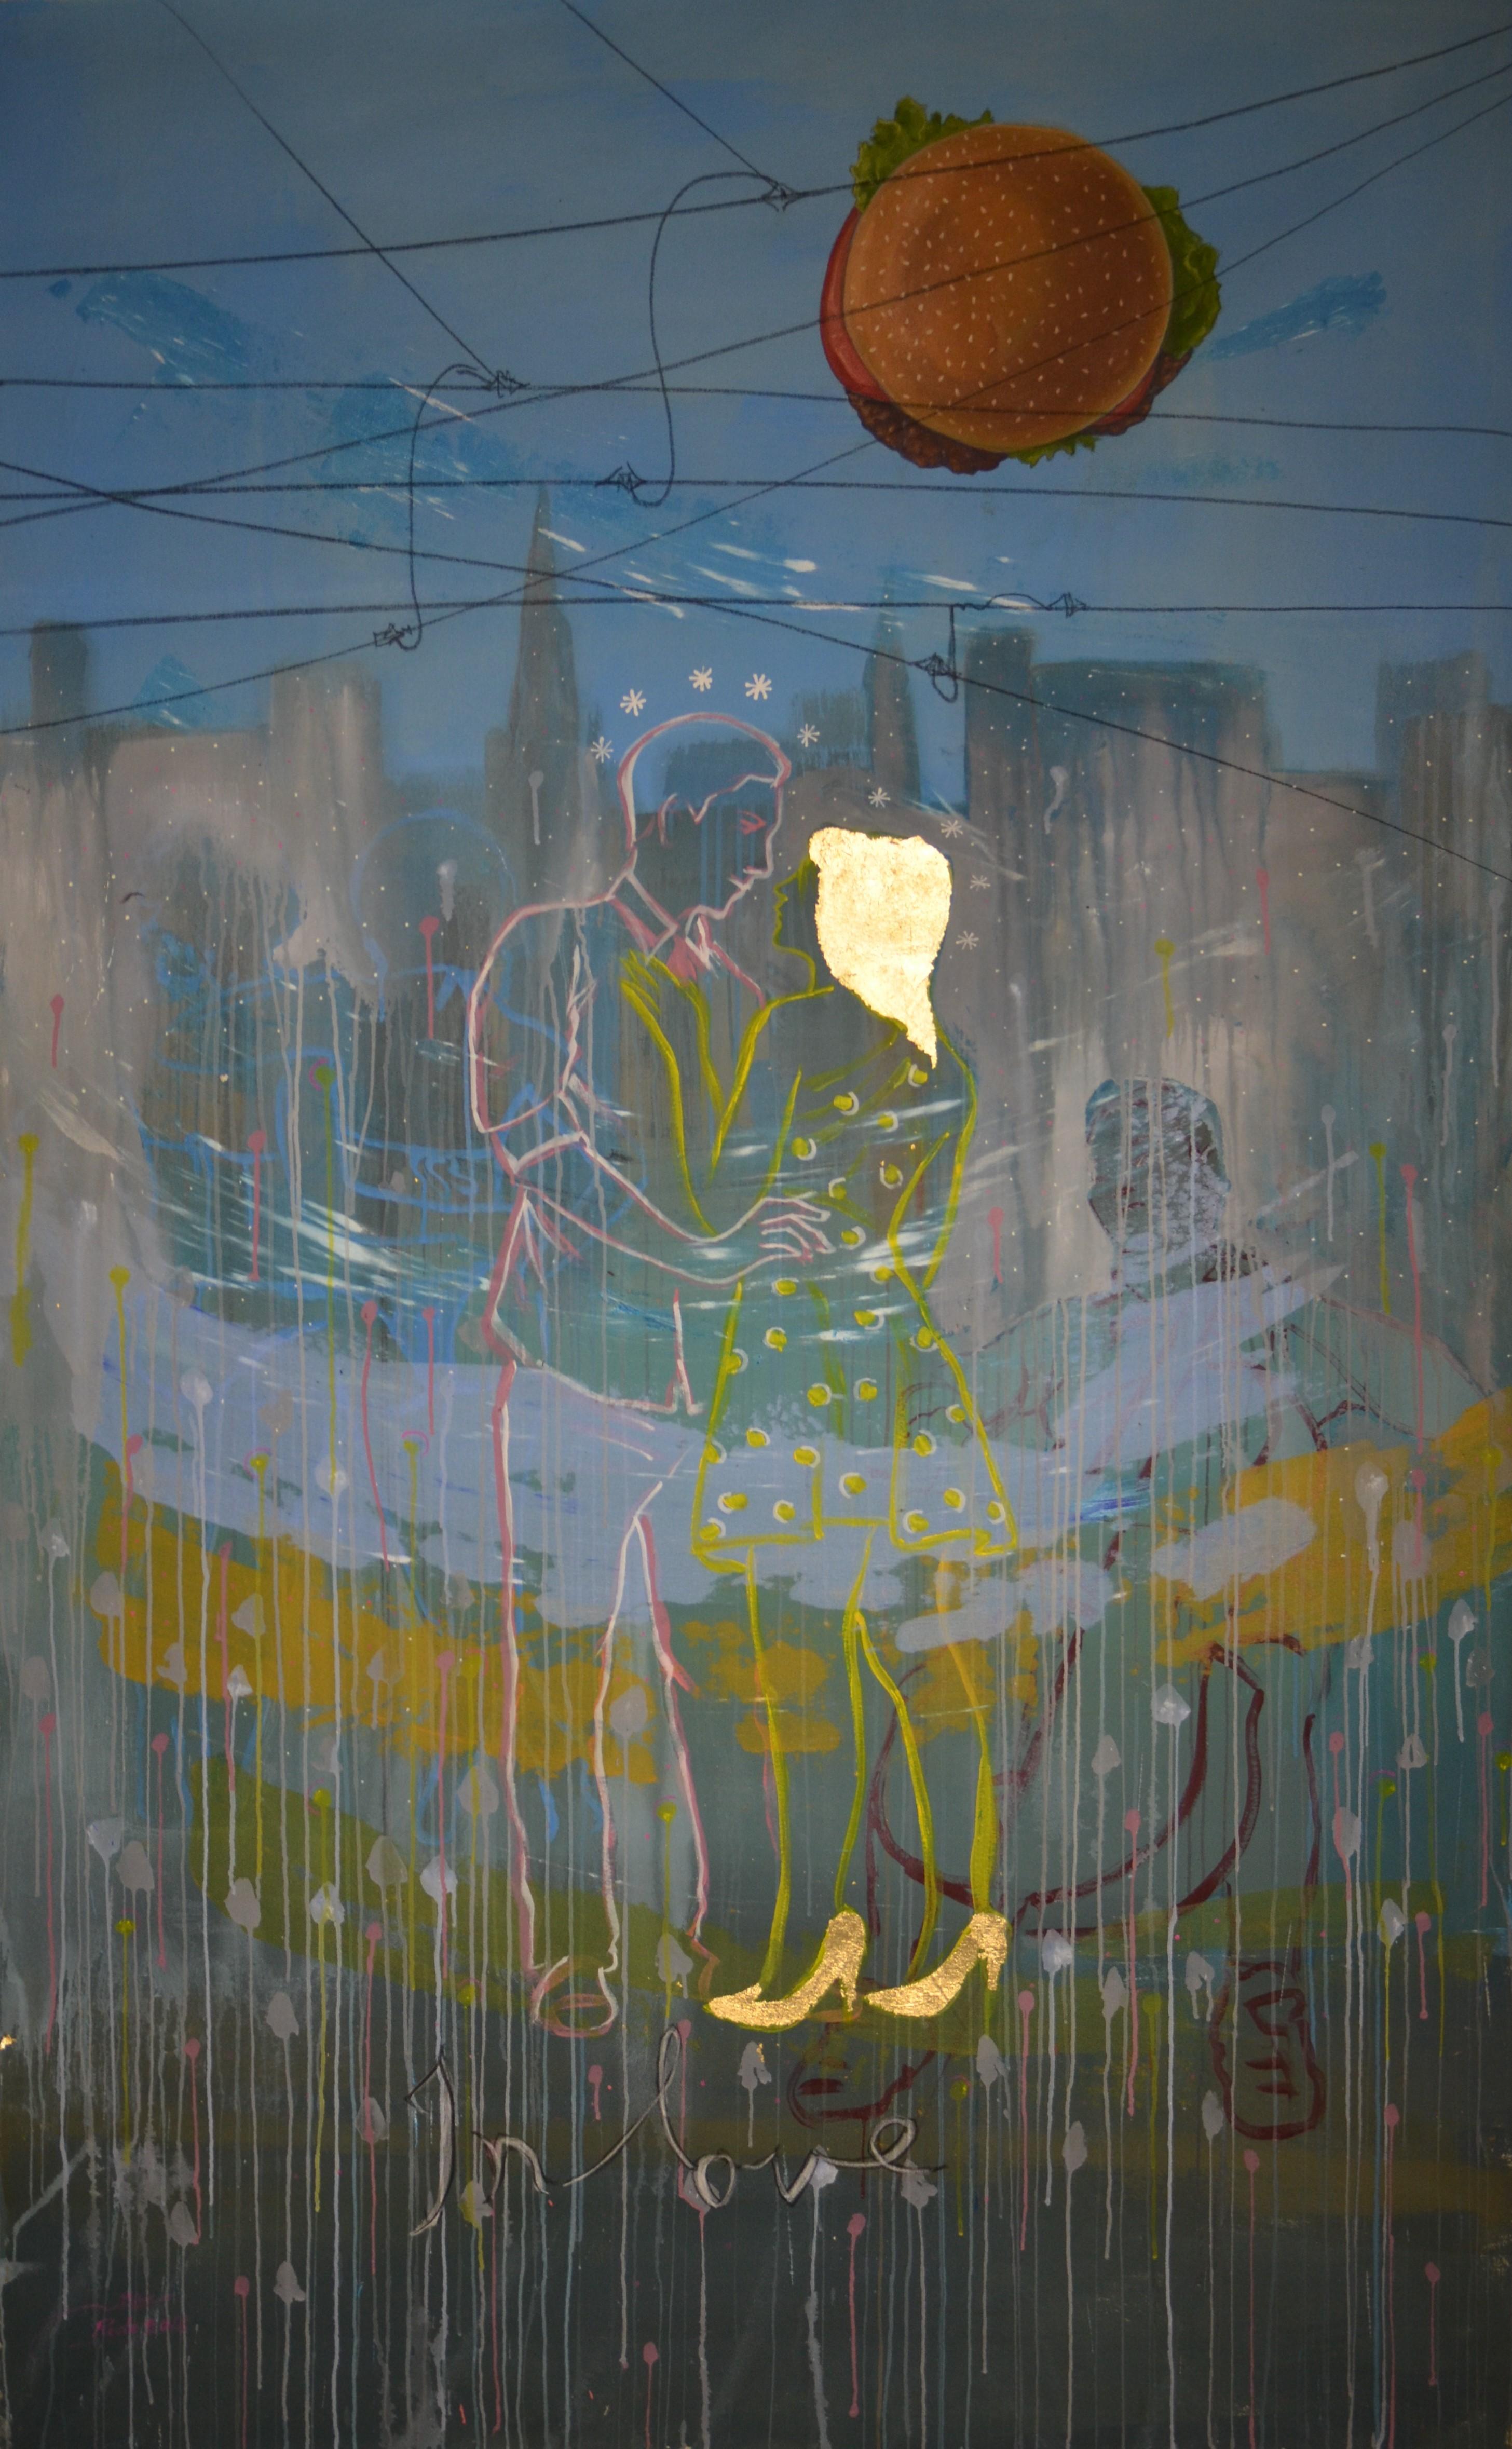 Hamburger Love, acrylic, tempra and gold leaf, 88 x 55 Inch 2017